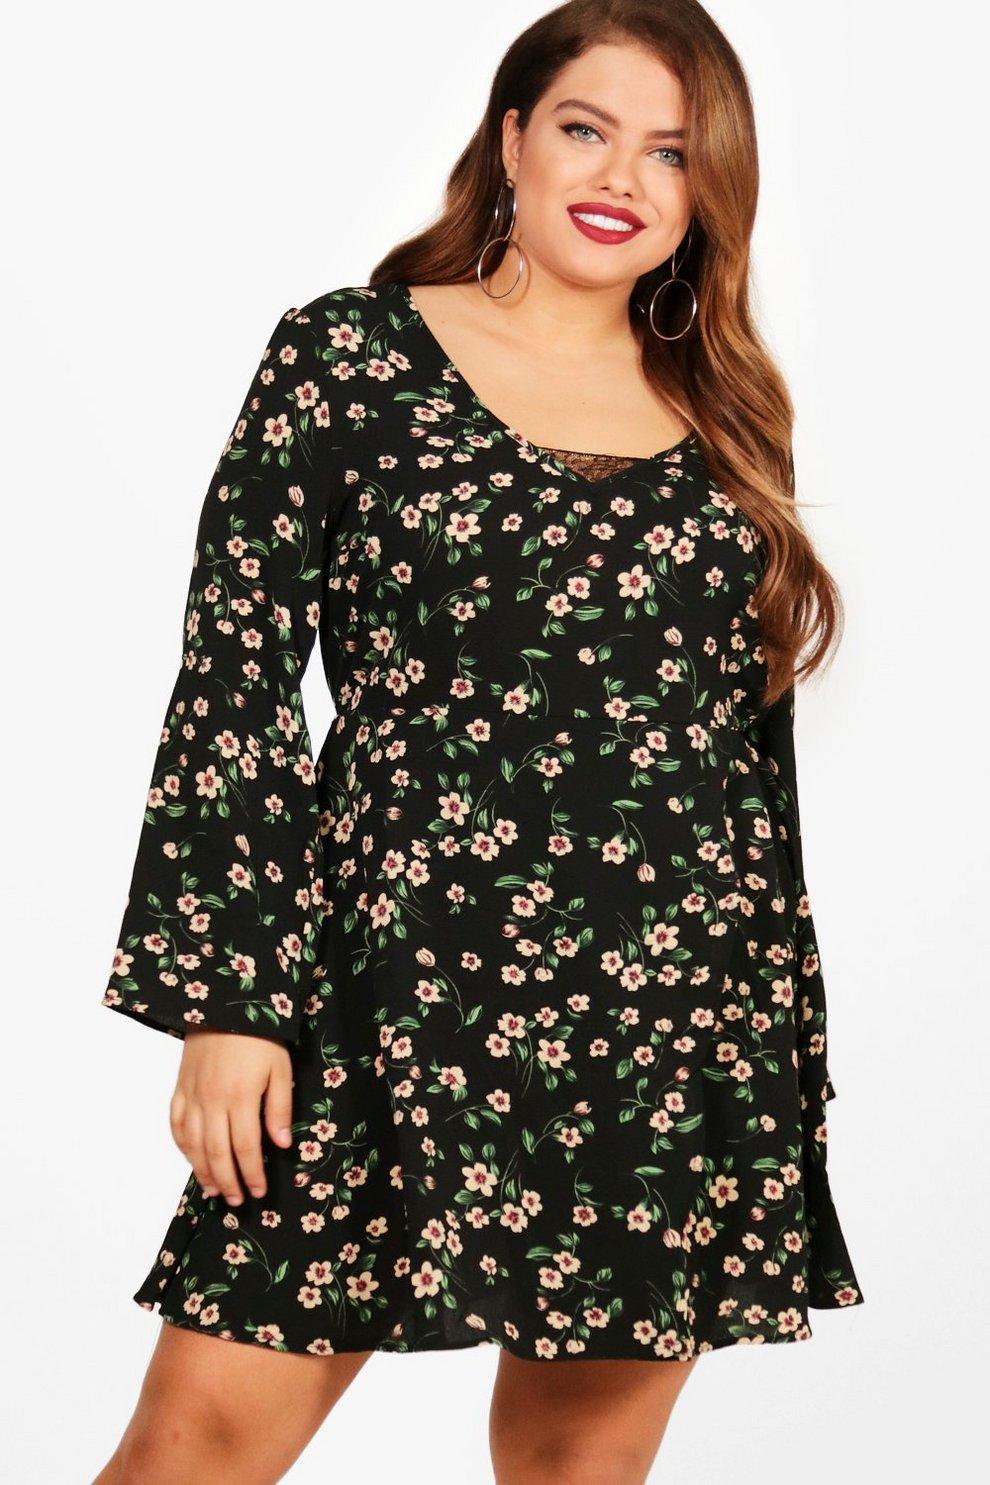 ef431a22695bd Womens Black Plus Floral Lace Insert Skater Dress